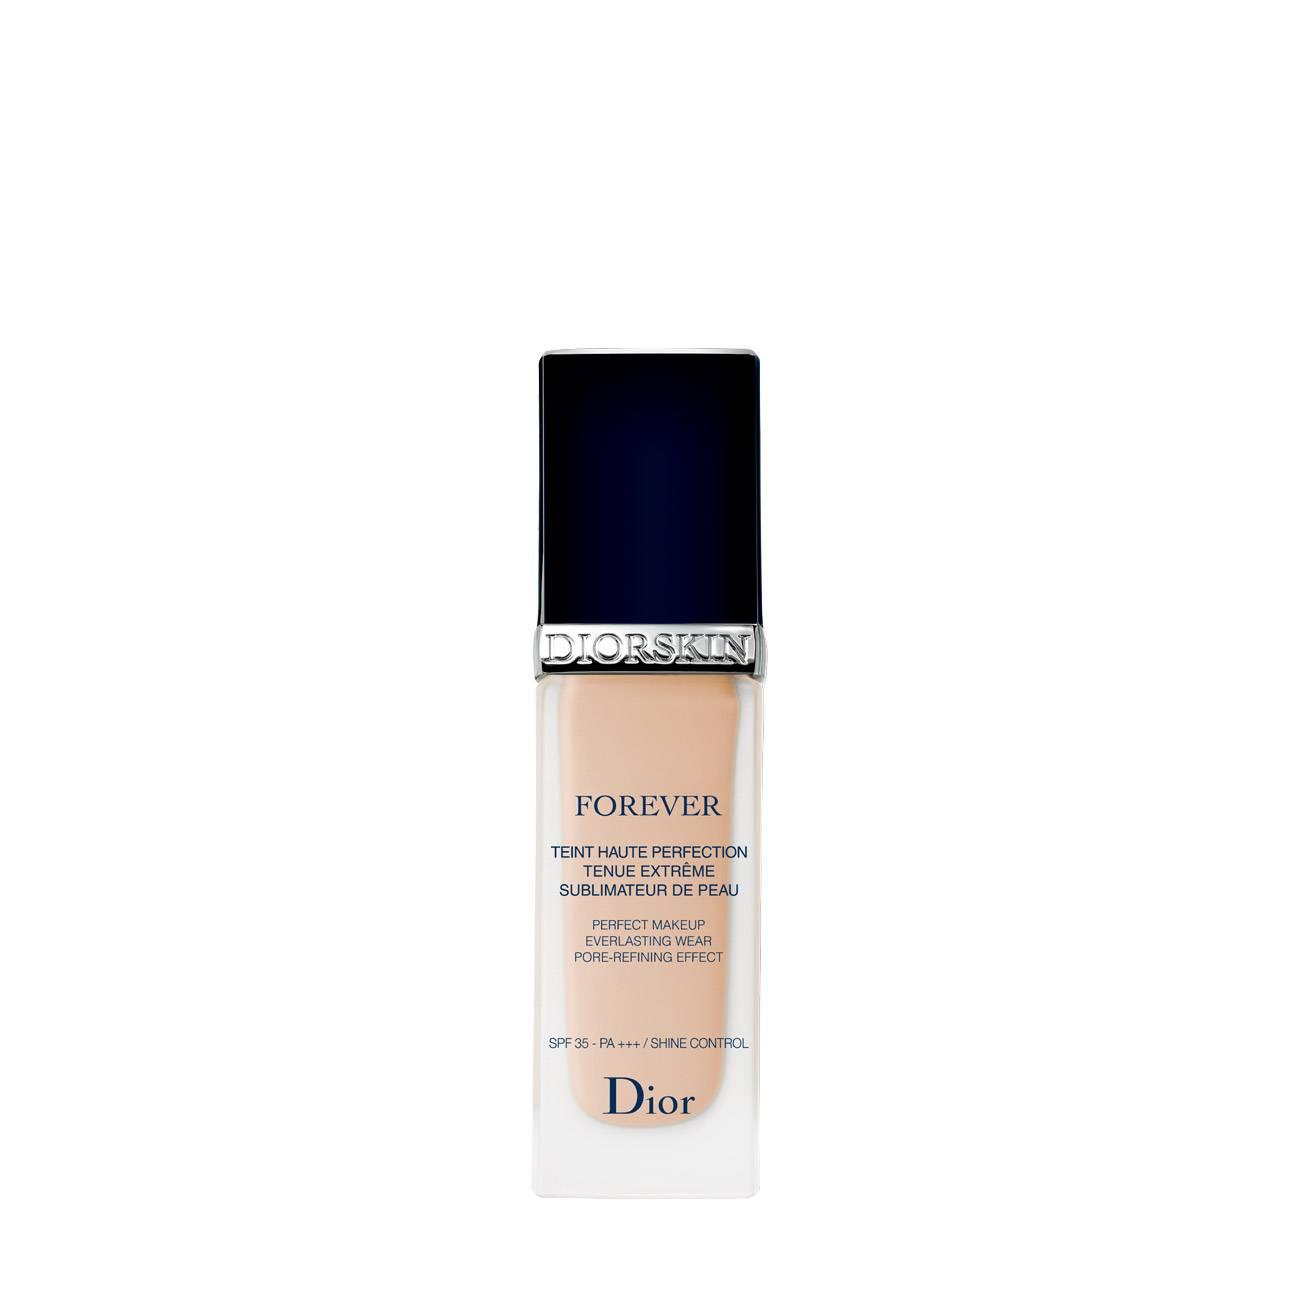 DIORSKIN FOREVER - 30 ml 010-Ivory